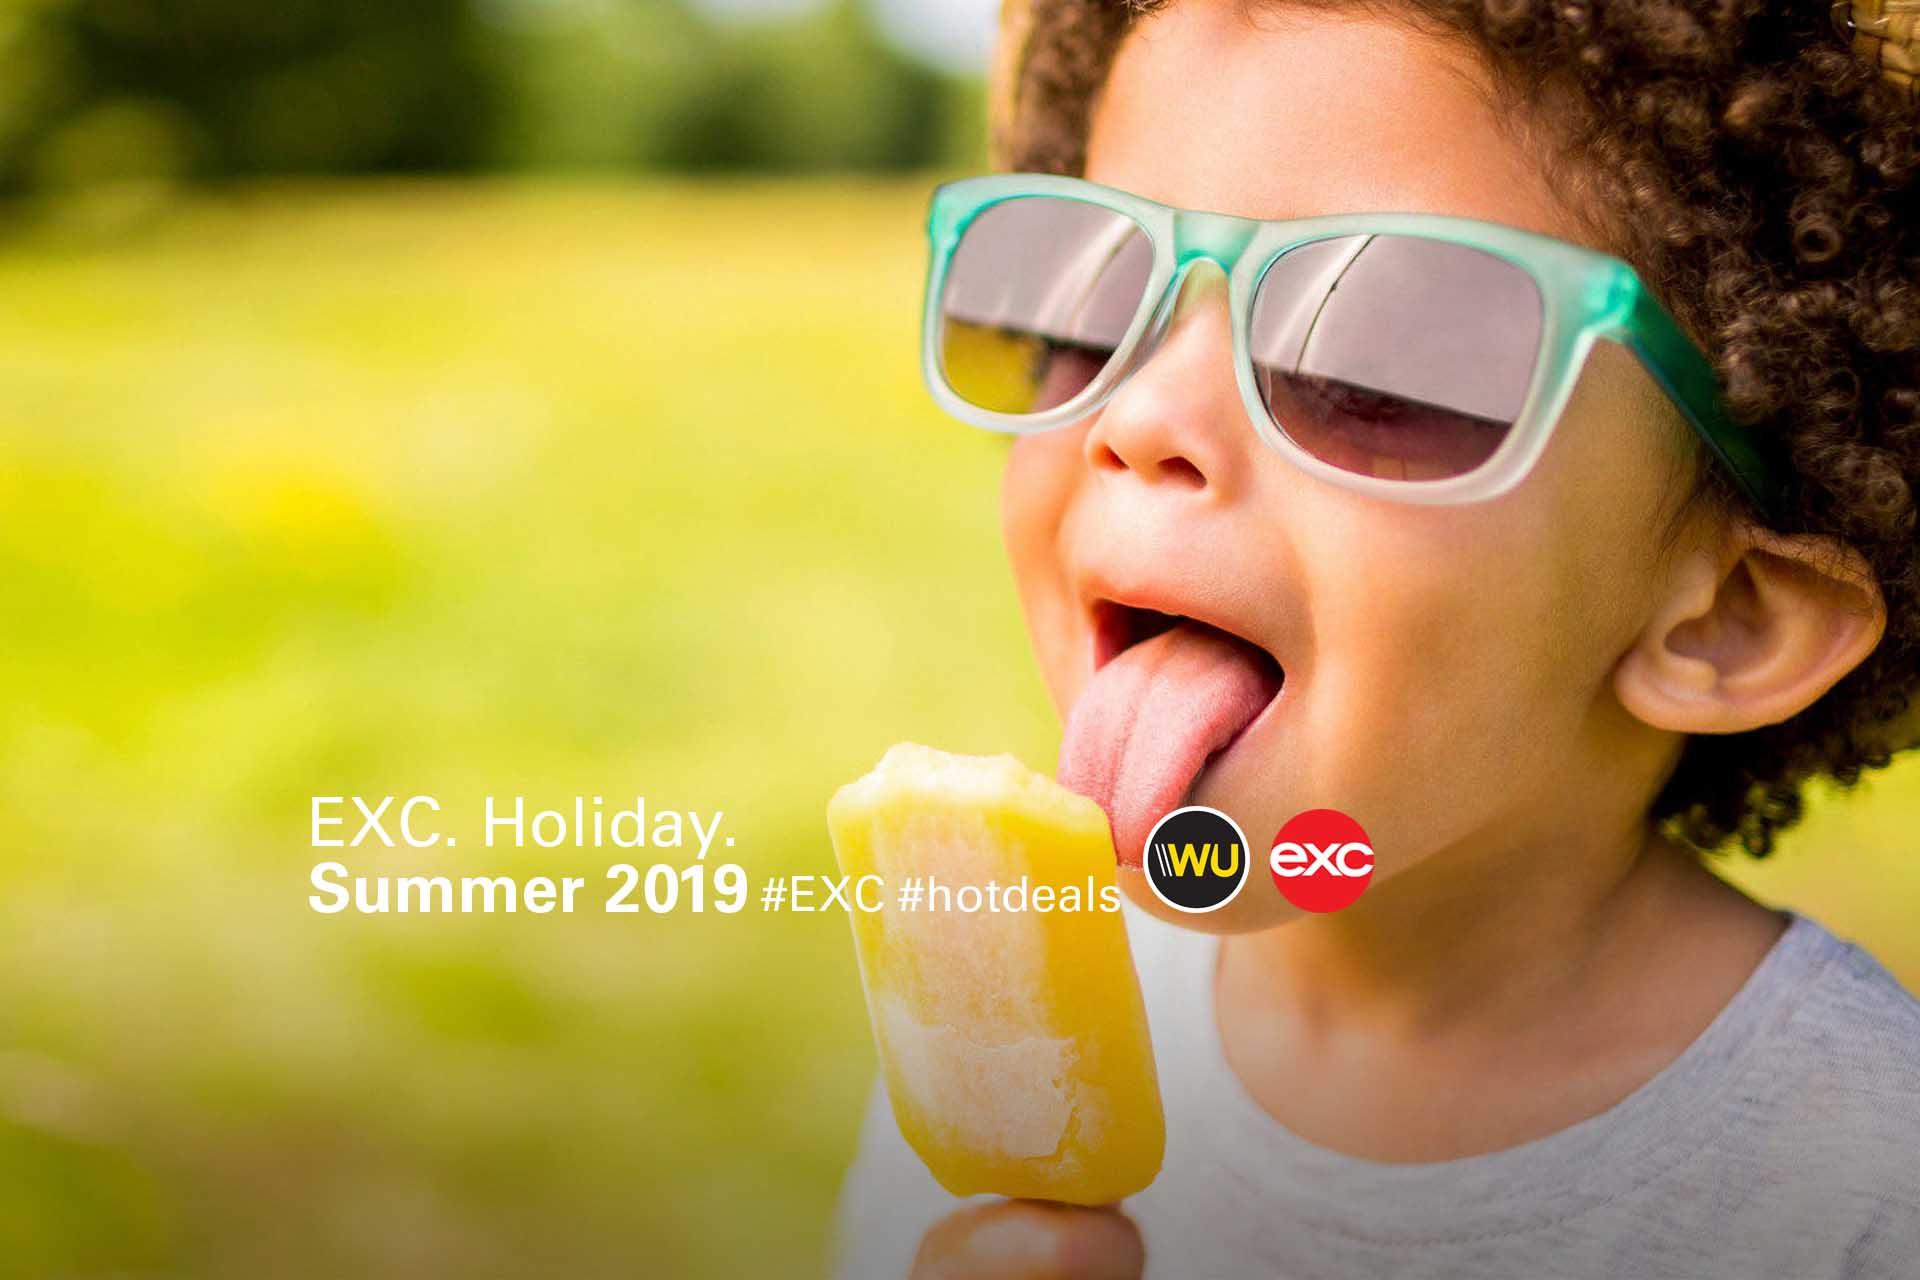 #Holiday #Summer 2019